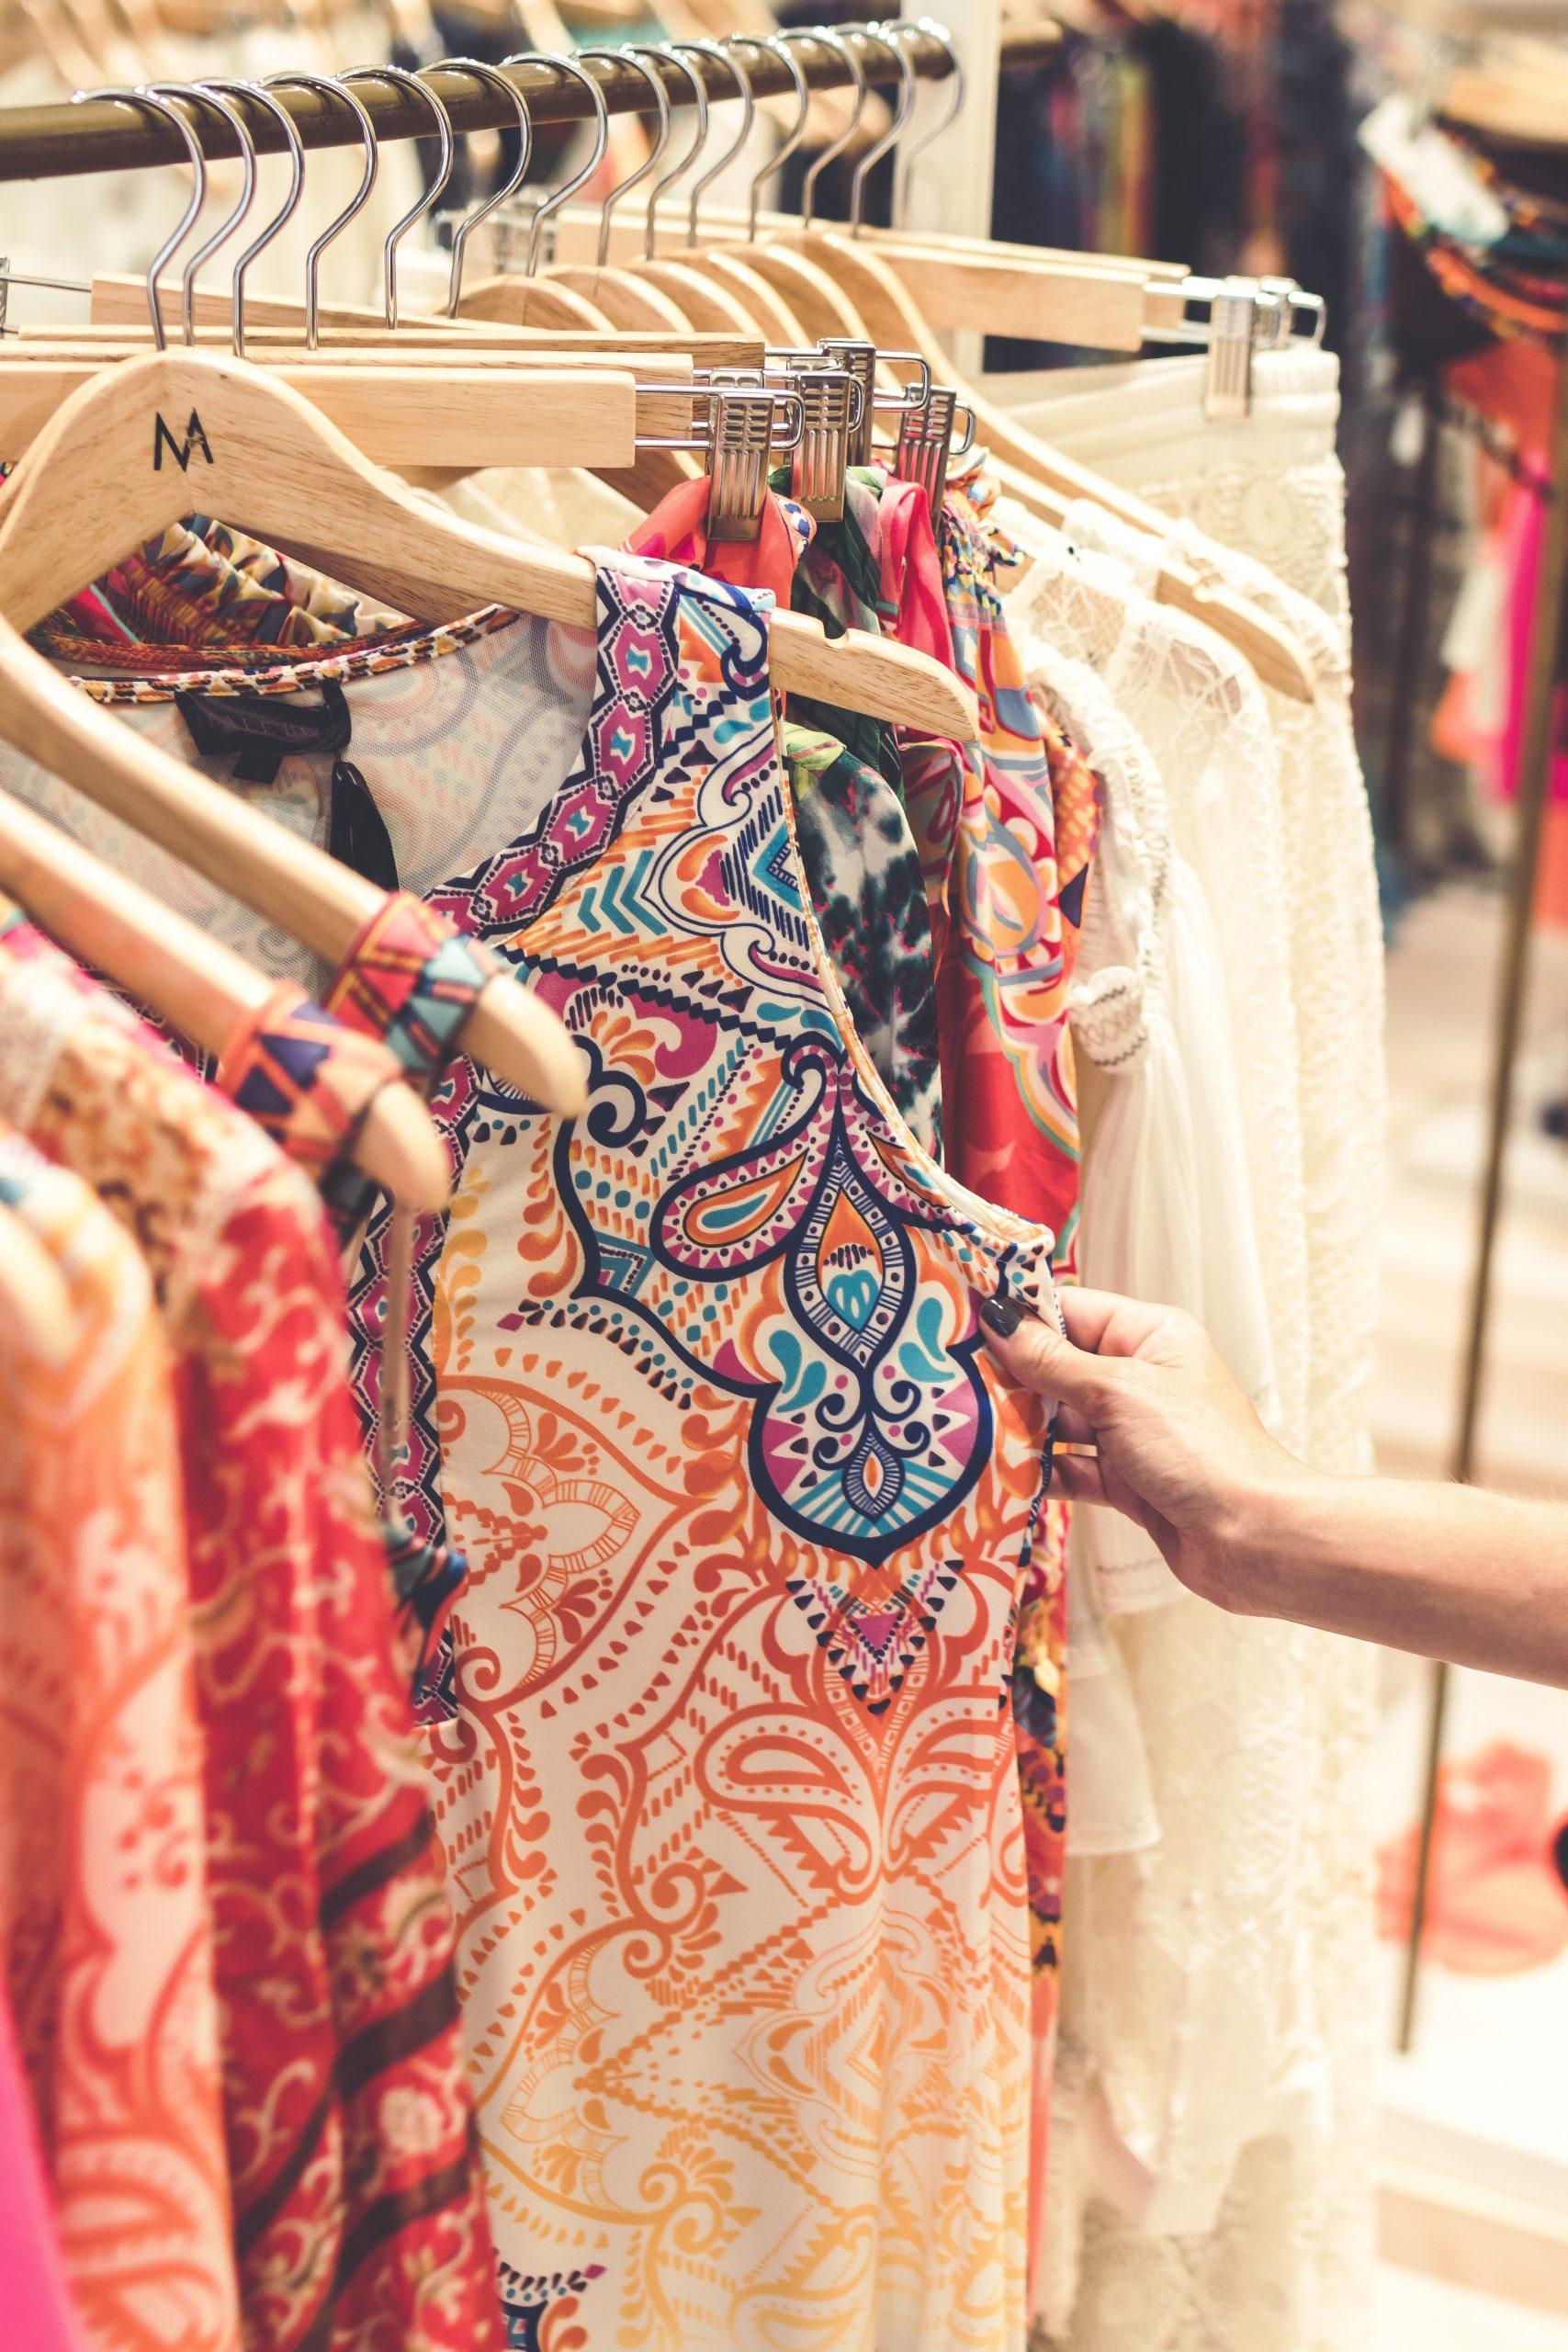 dresses Australia, clothing, intimate clothes